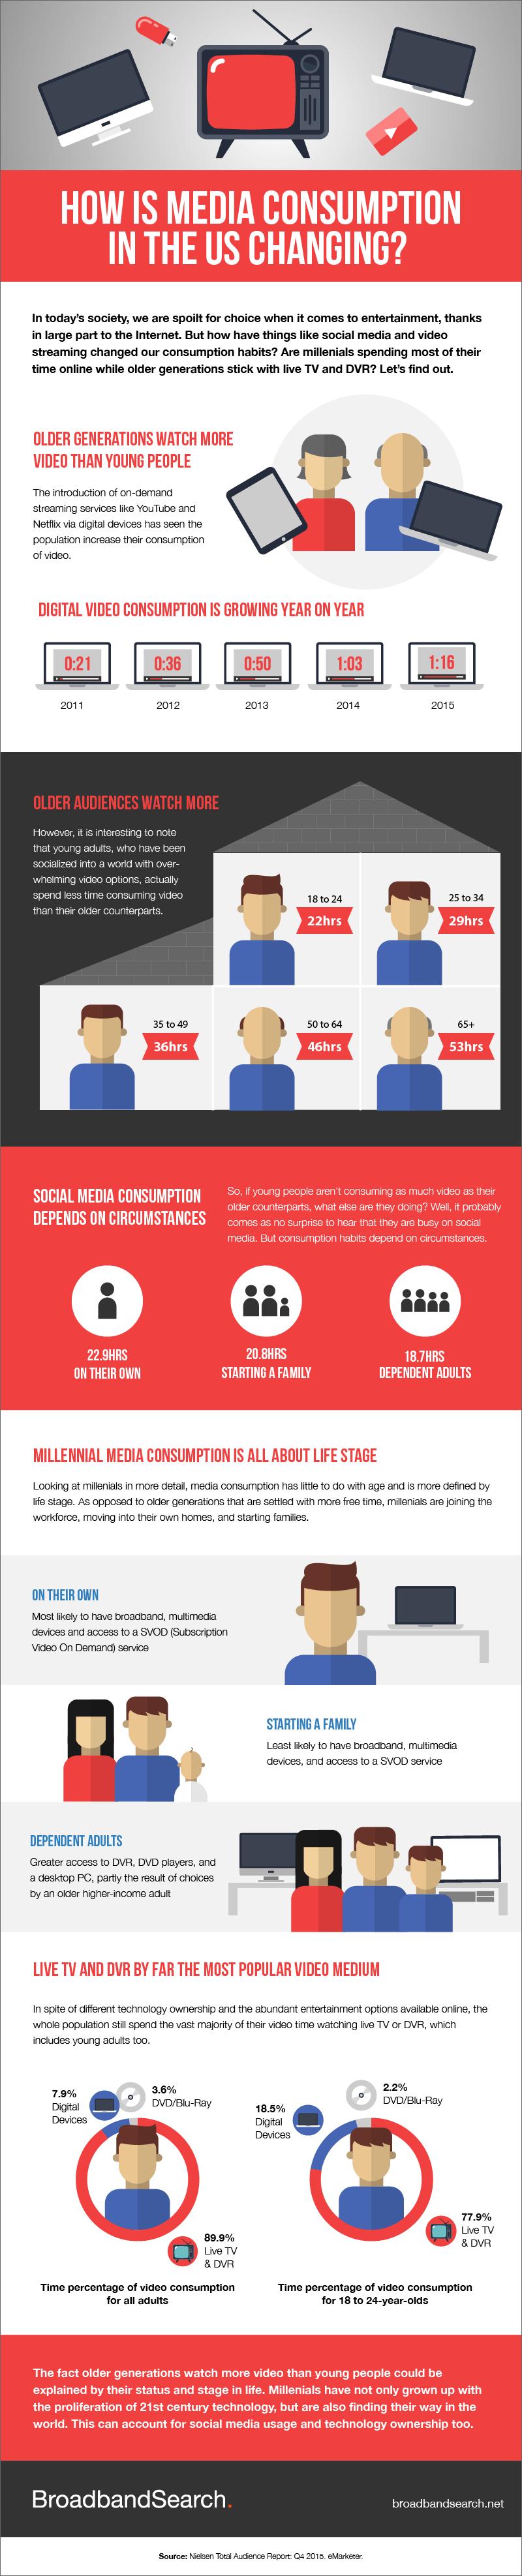 Media consumption habits infographic